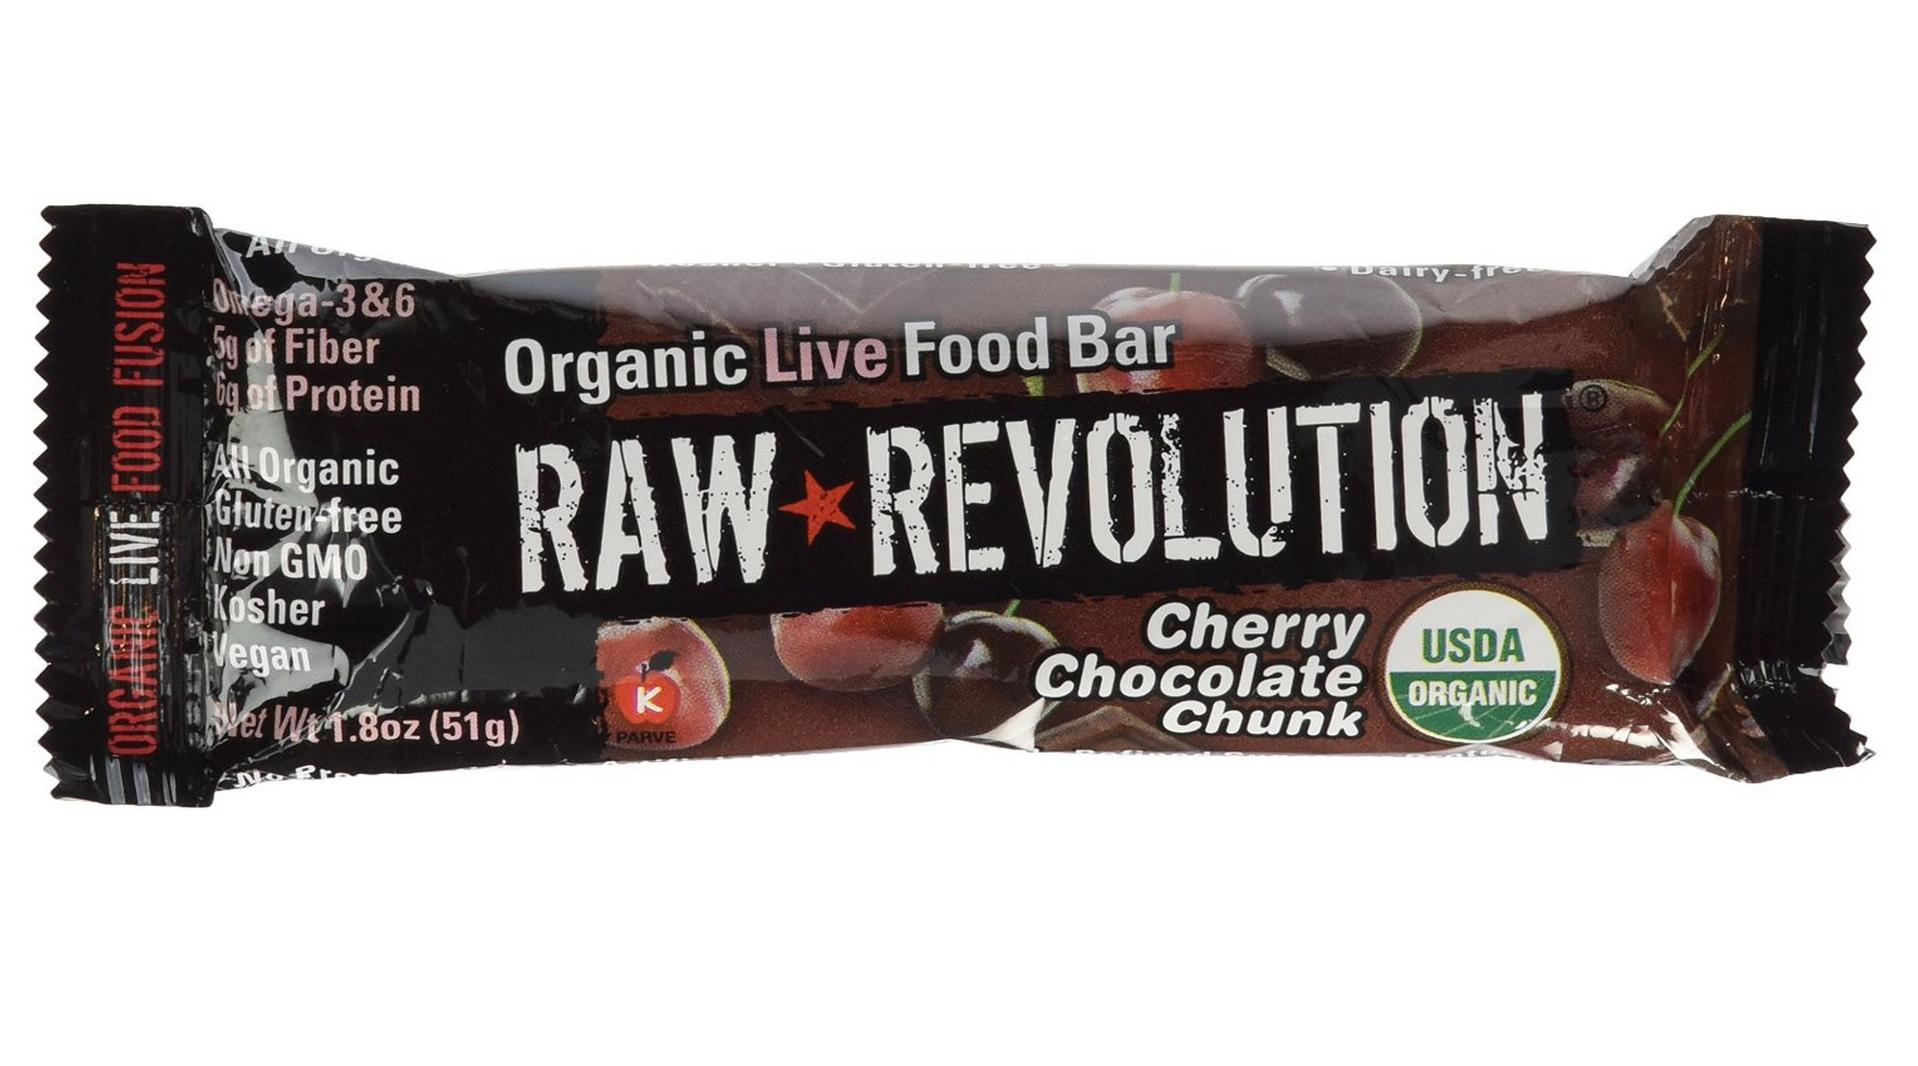 Raw Revolution Organic Live Food Bars Only $1.06 Each Shipped! (Gluten-Free, Kosher, Vegan!)